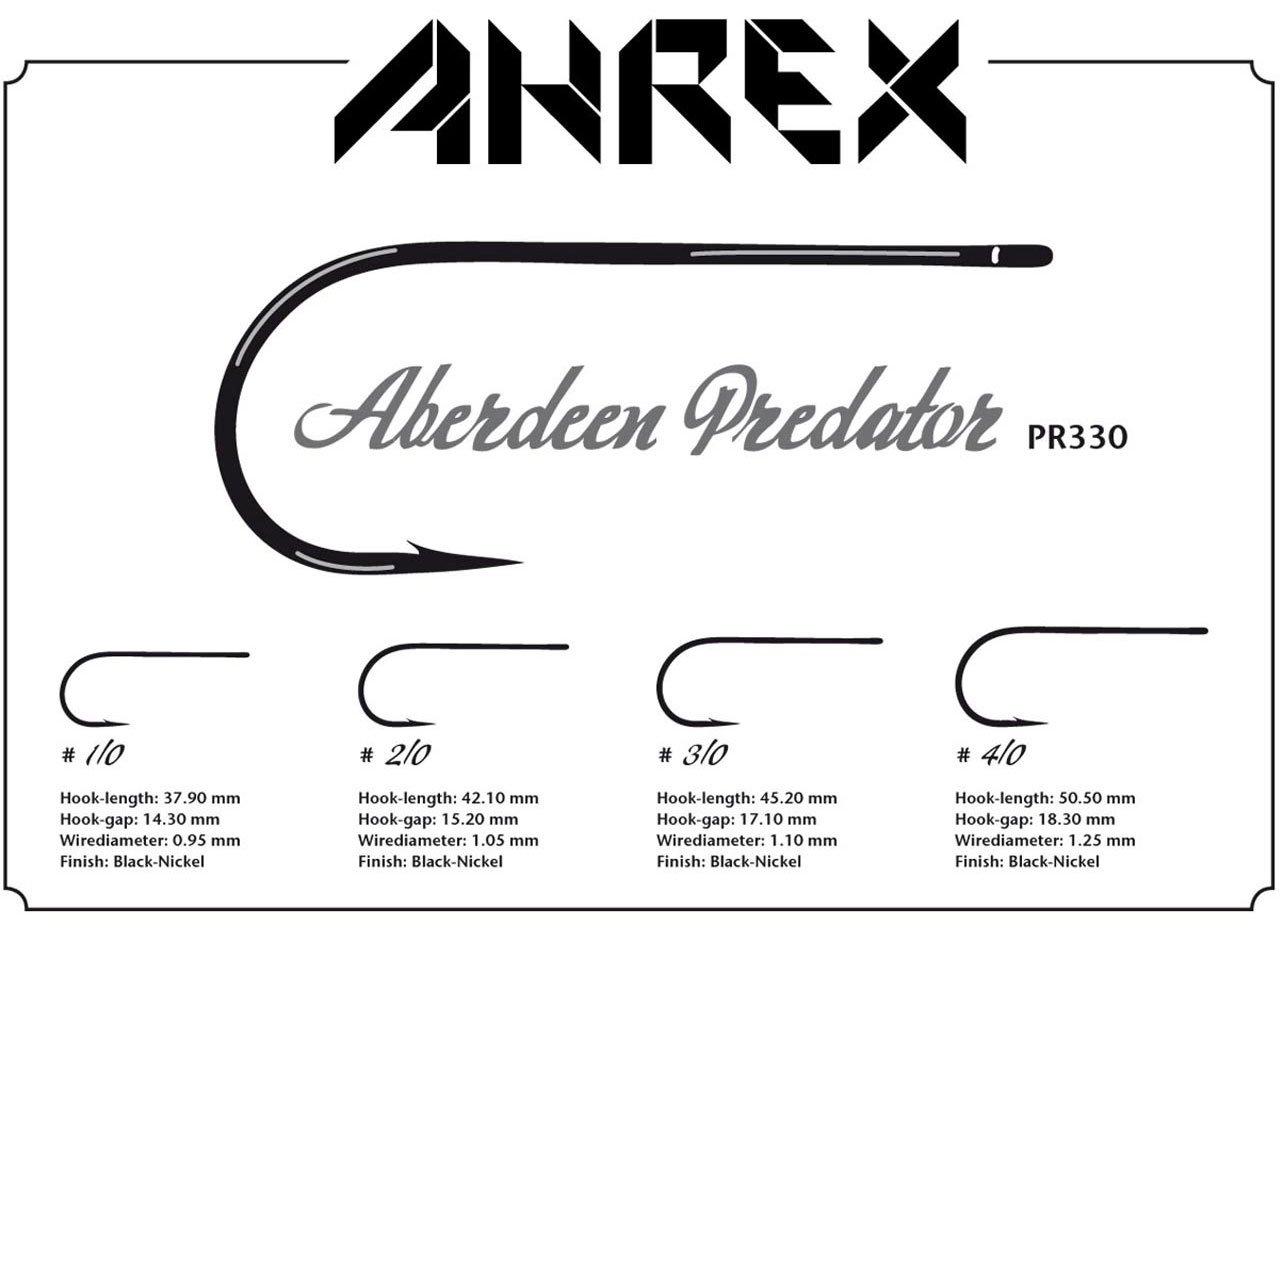 ahrex amo aberdeen predator